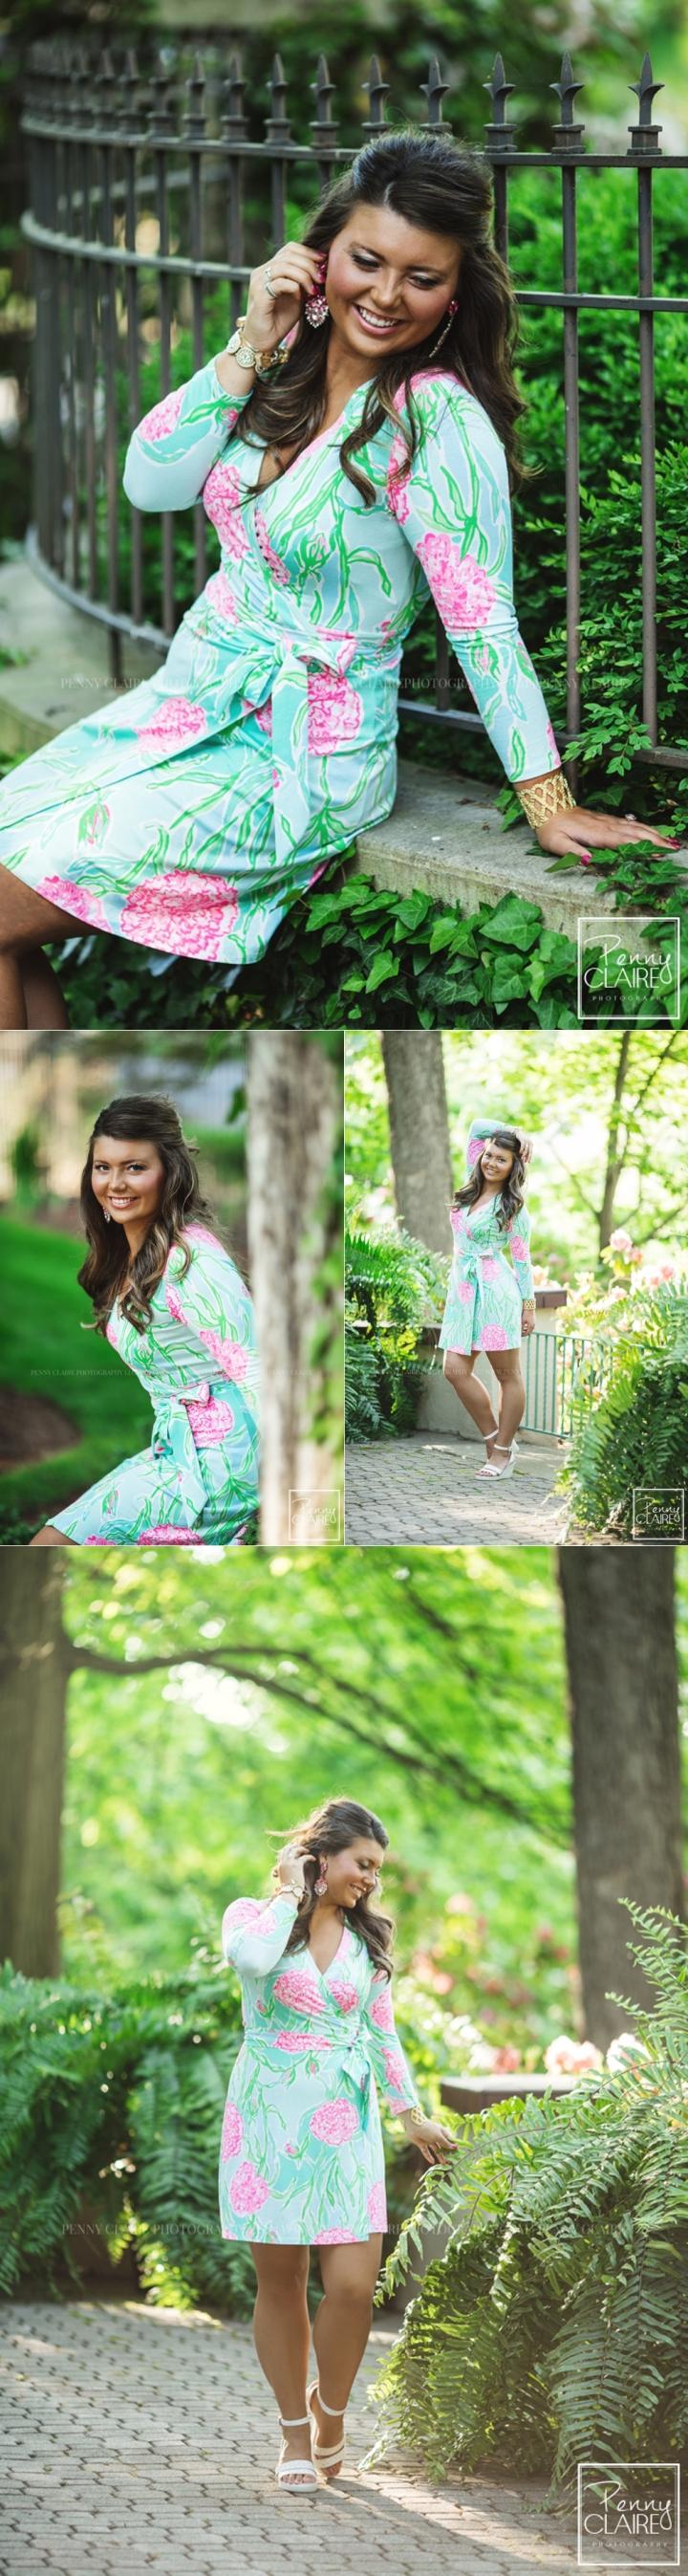 Glamour_Photography_Zanesville 3